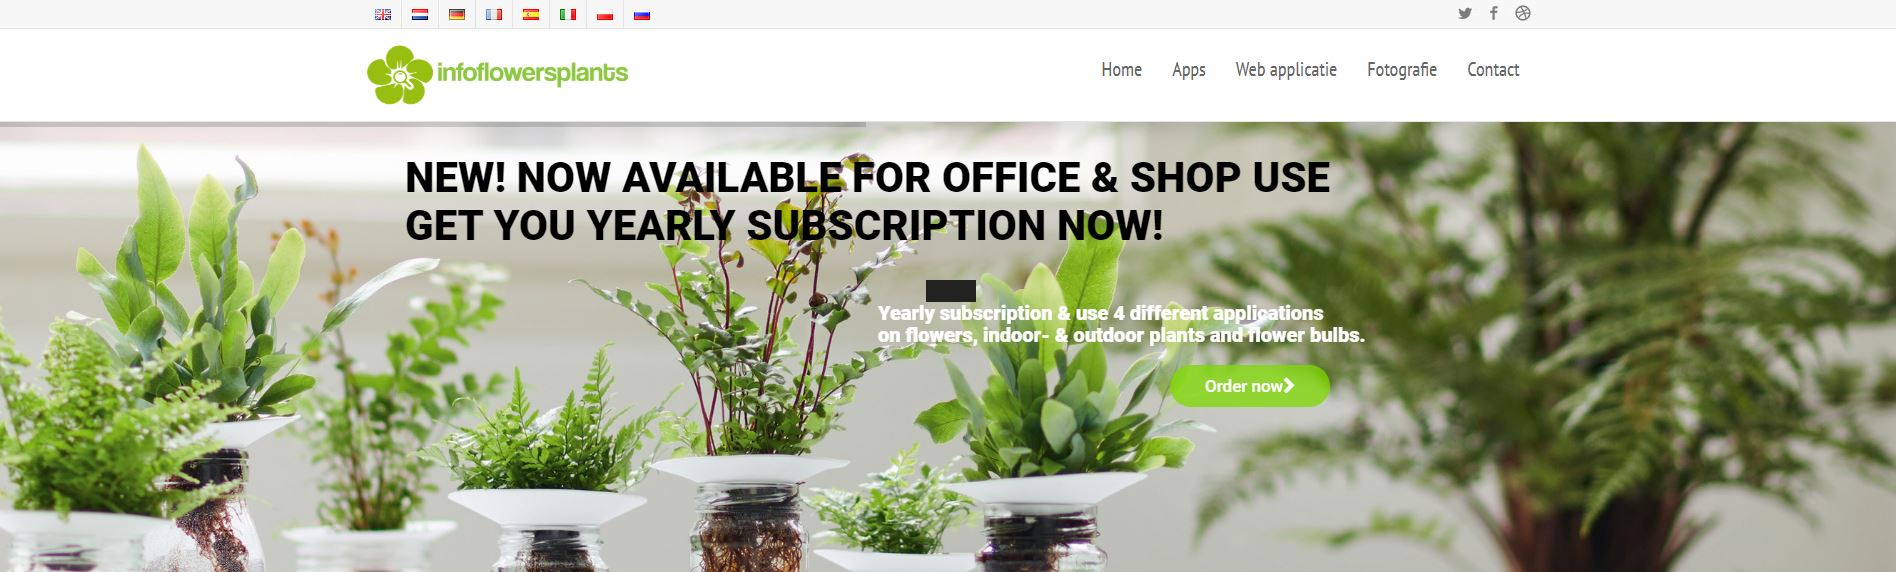 Webapp InfoFlowersPlants